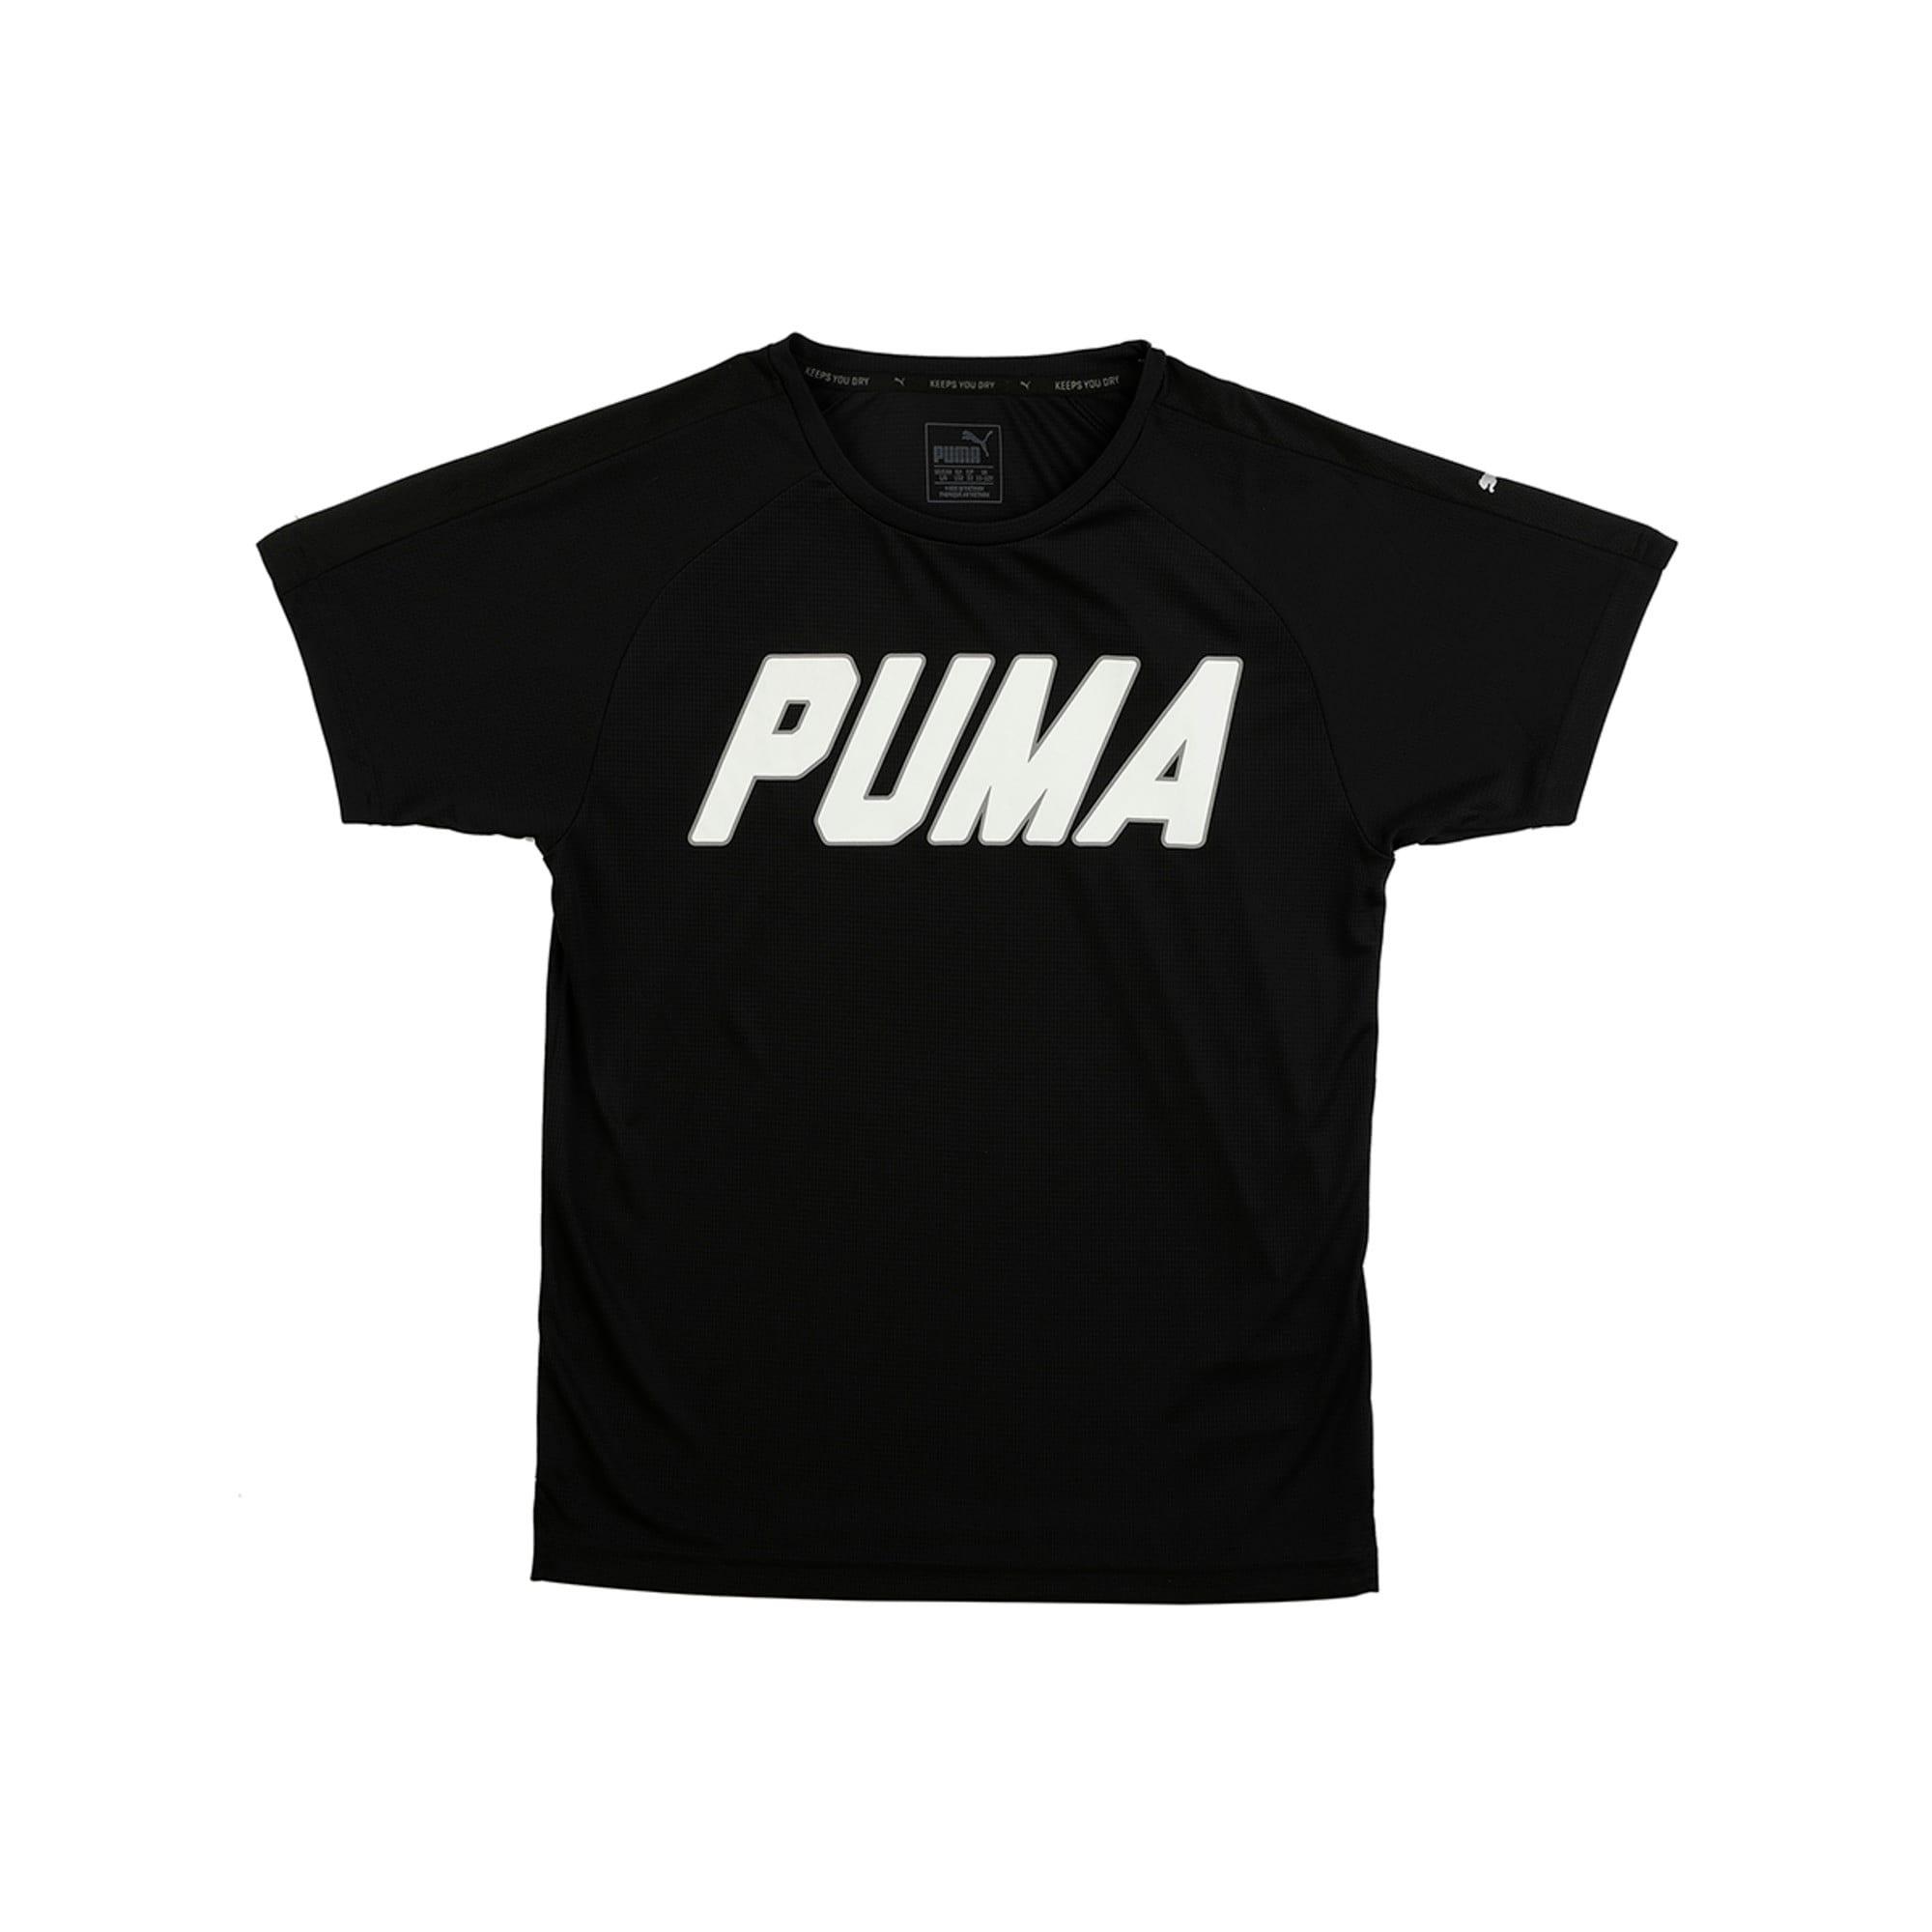 Thumbnail 2 of Gym Graphic Tee Puma Black, Puma Black, medium-IND